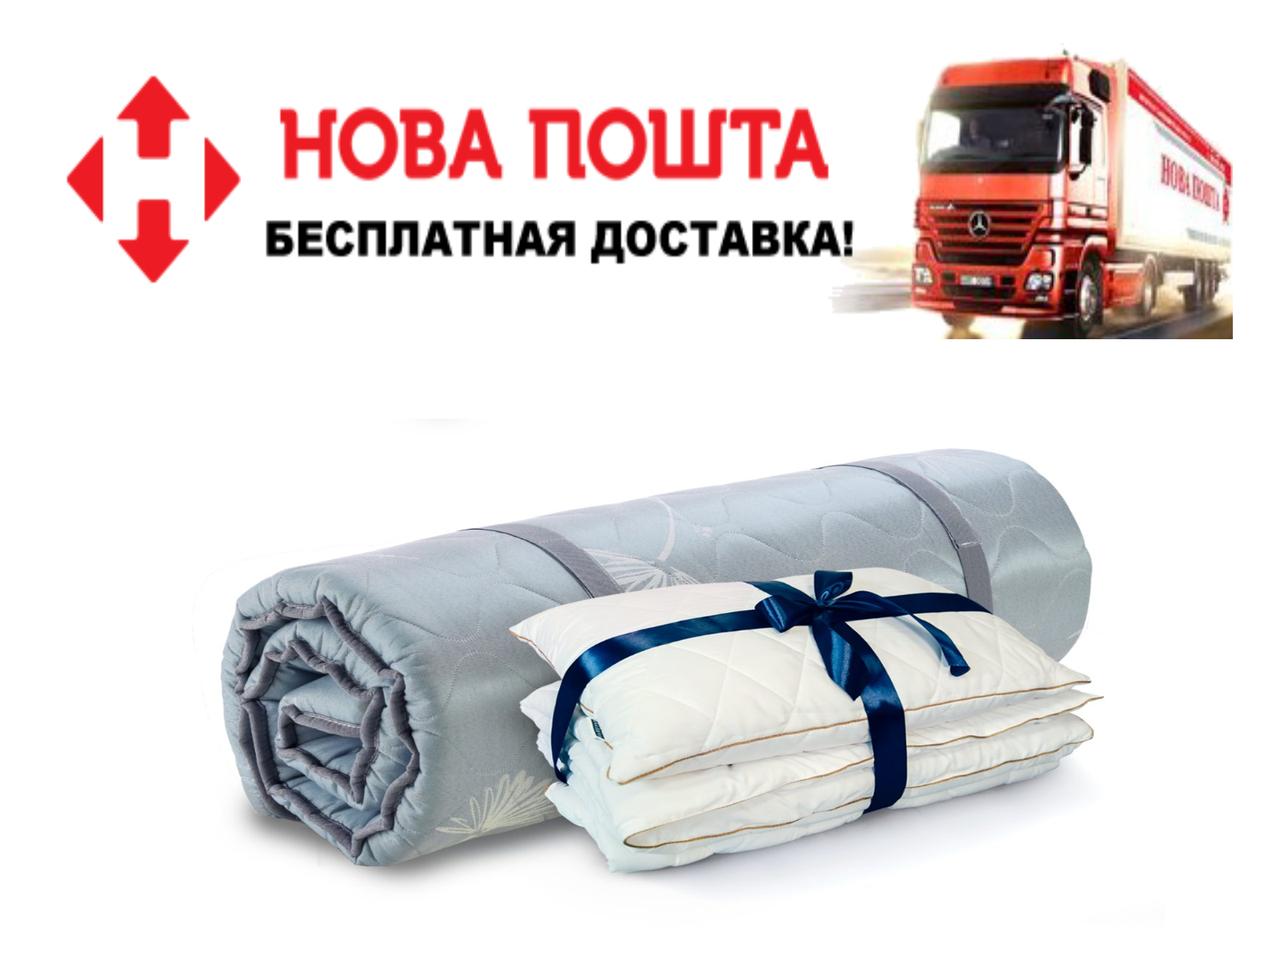 Матрас Дормео  Ролл Ап Зеленый чай  60*190